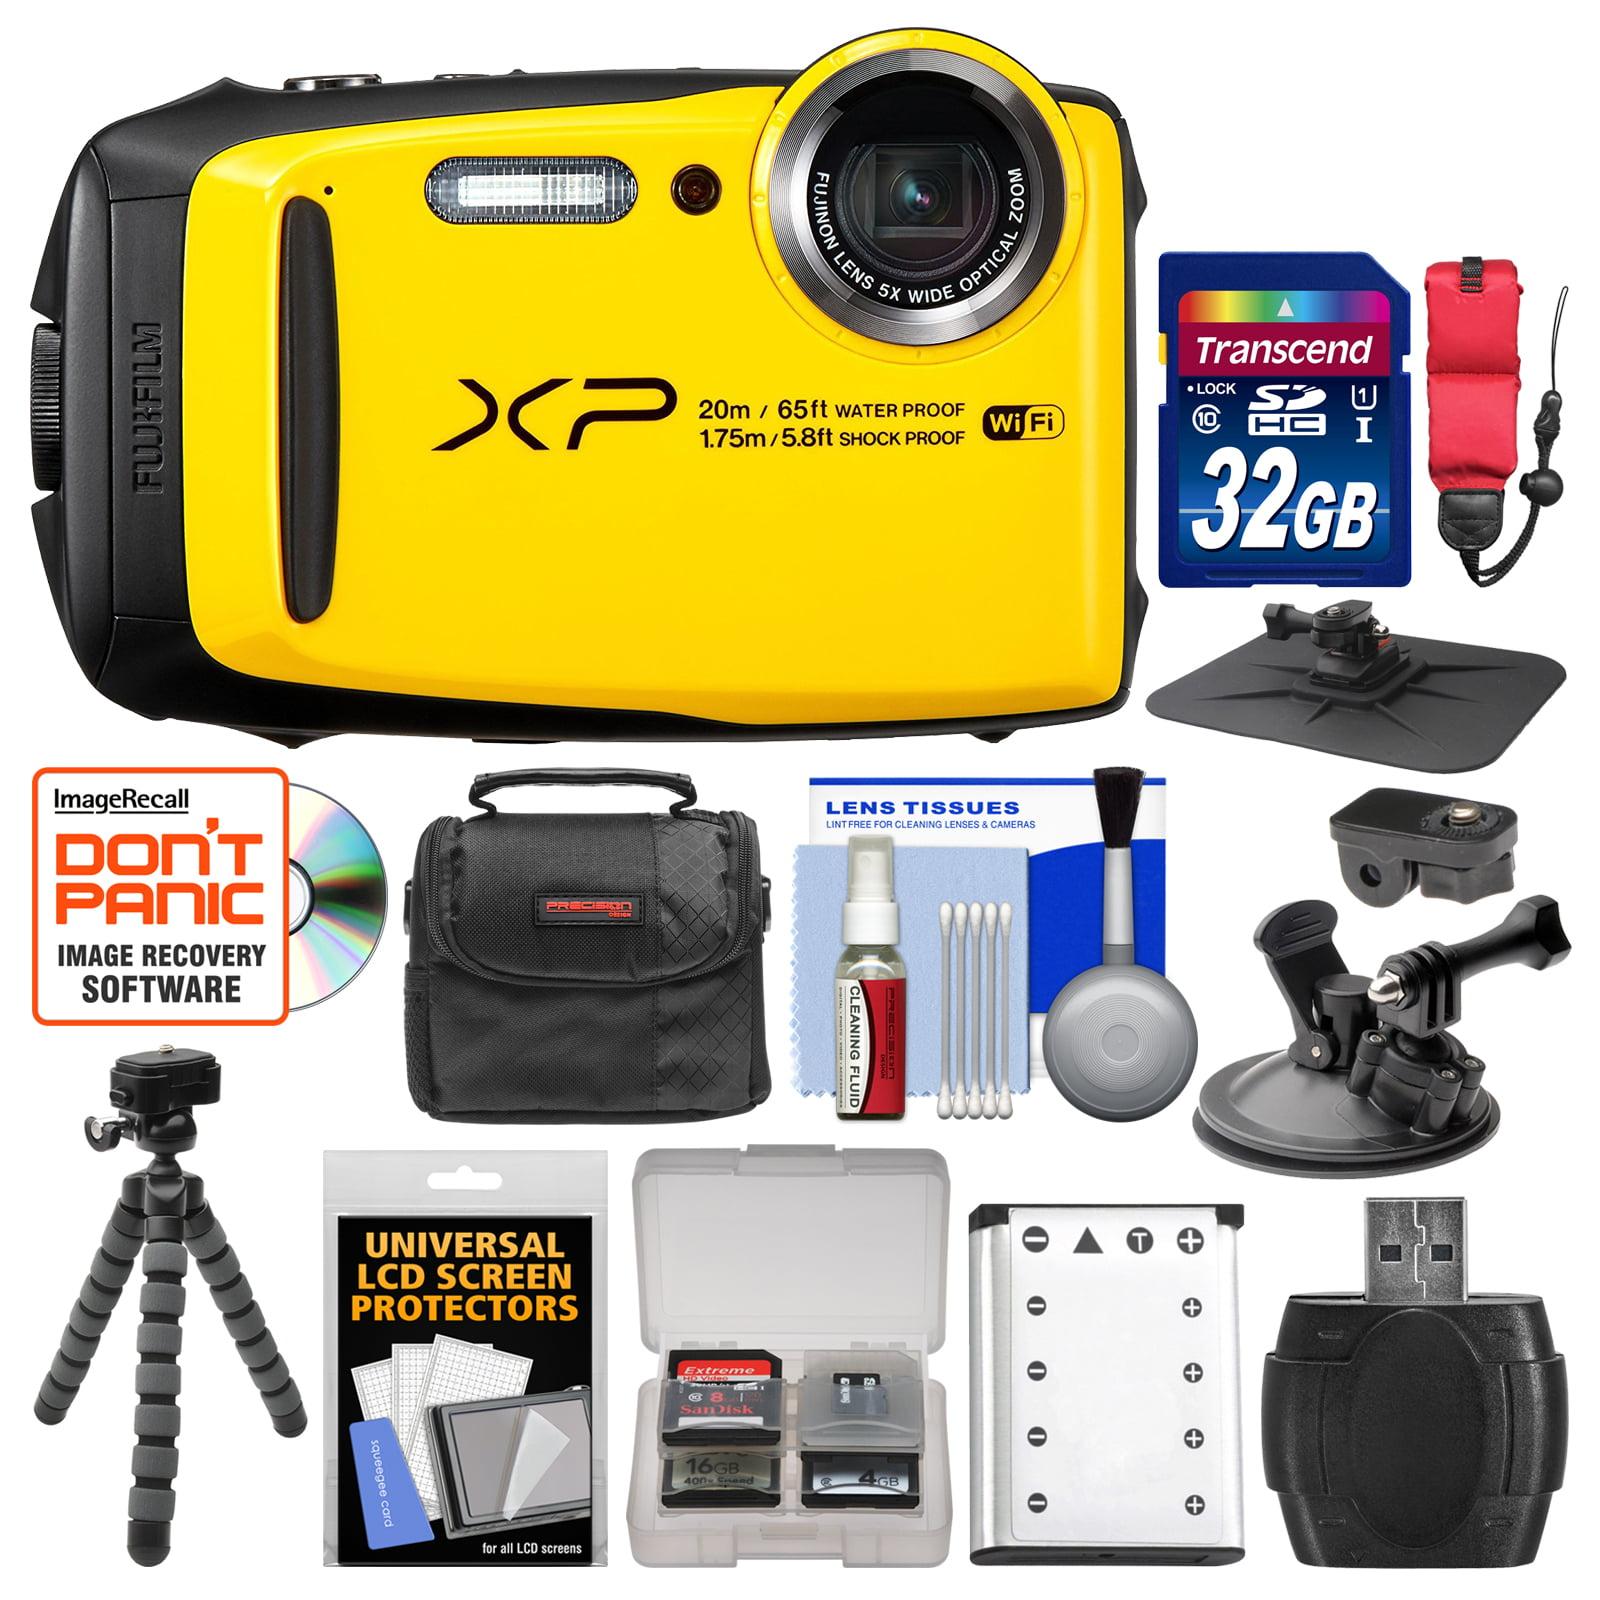 FujiFilm FinePix XP120 Shock & Waterproof Wi-Fi Digital Camera (Yellow) with 32GB Card + Case + Battery + Flex Tripod +... by Fujifilm